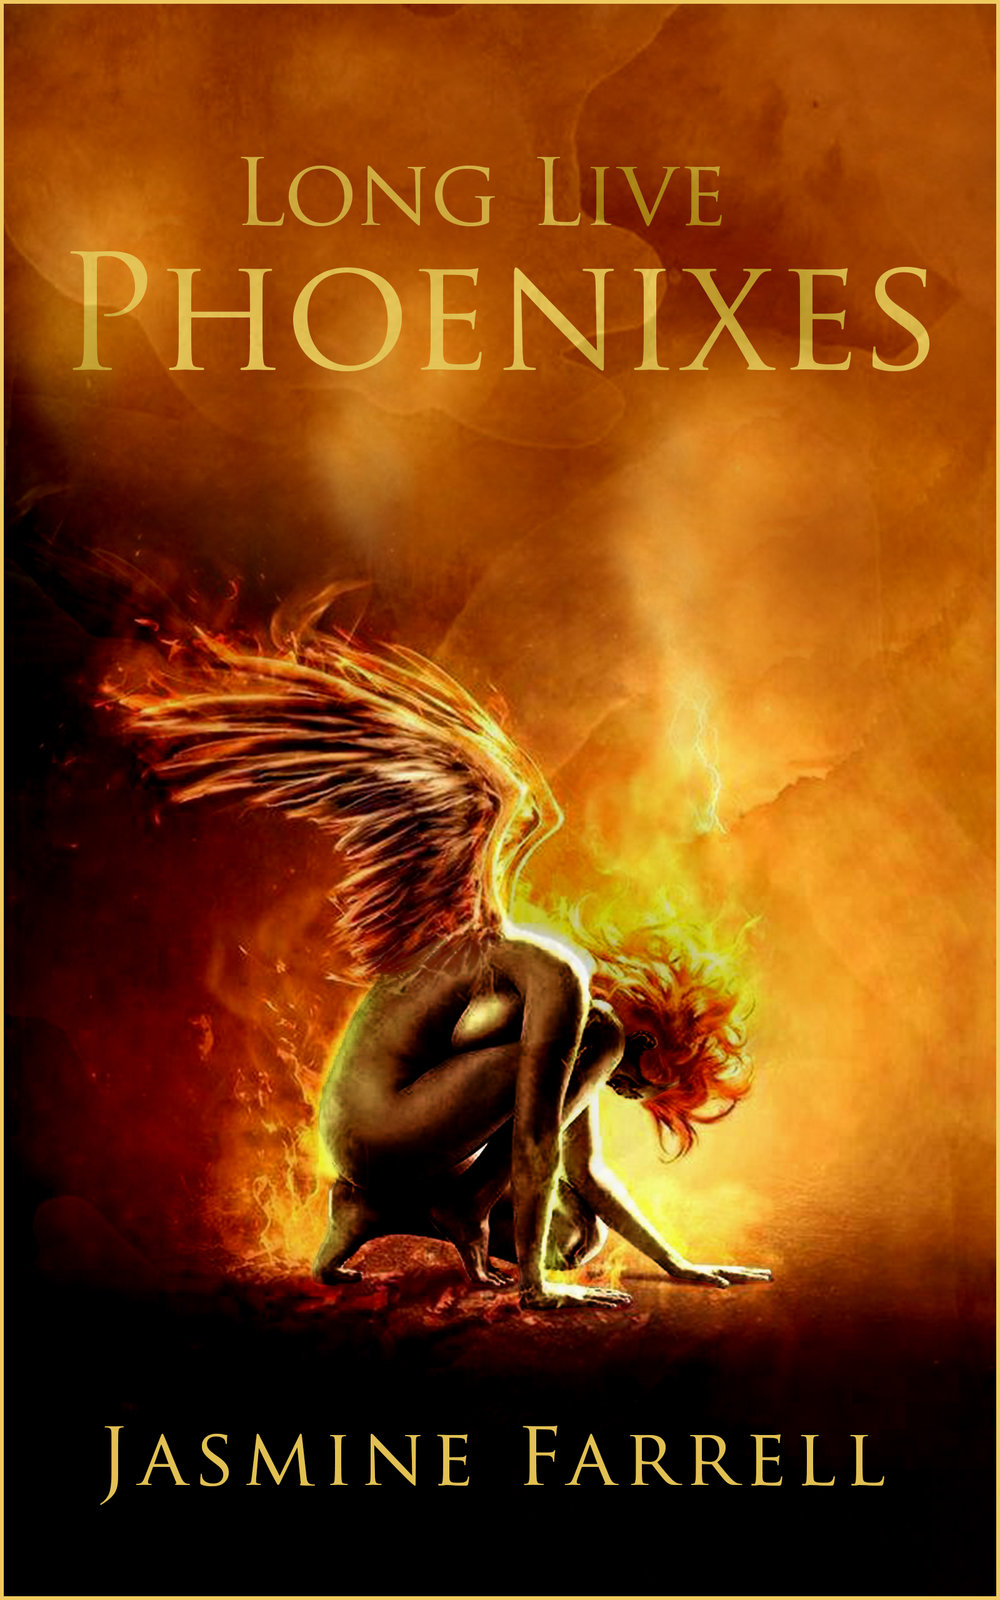 Long Live Phoenixes